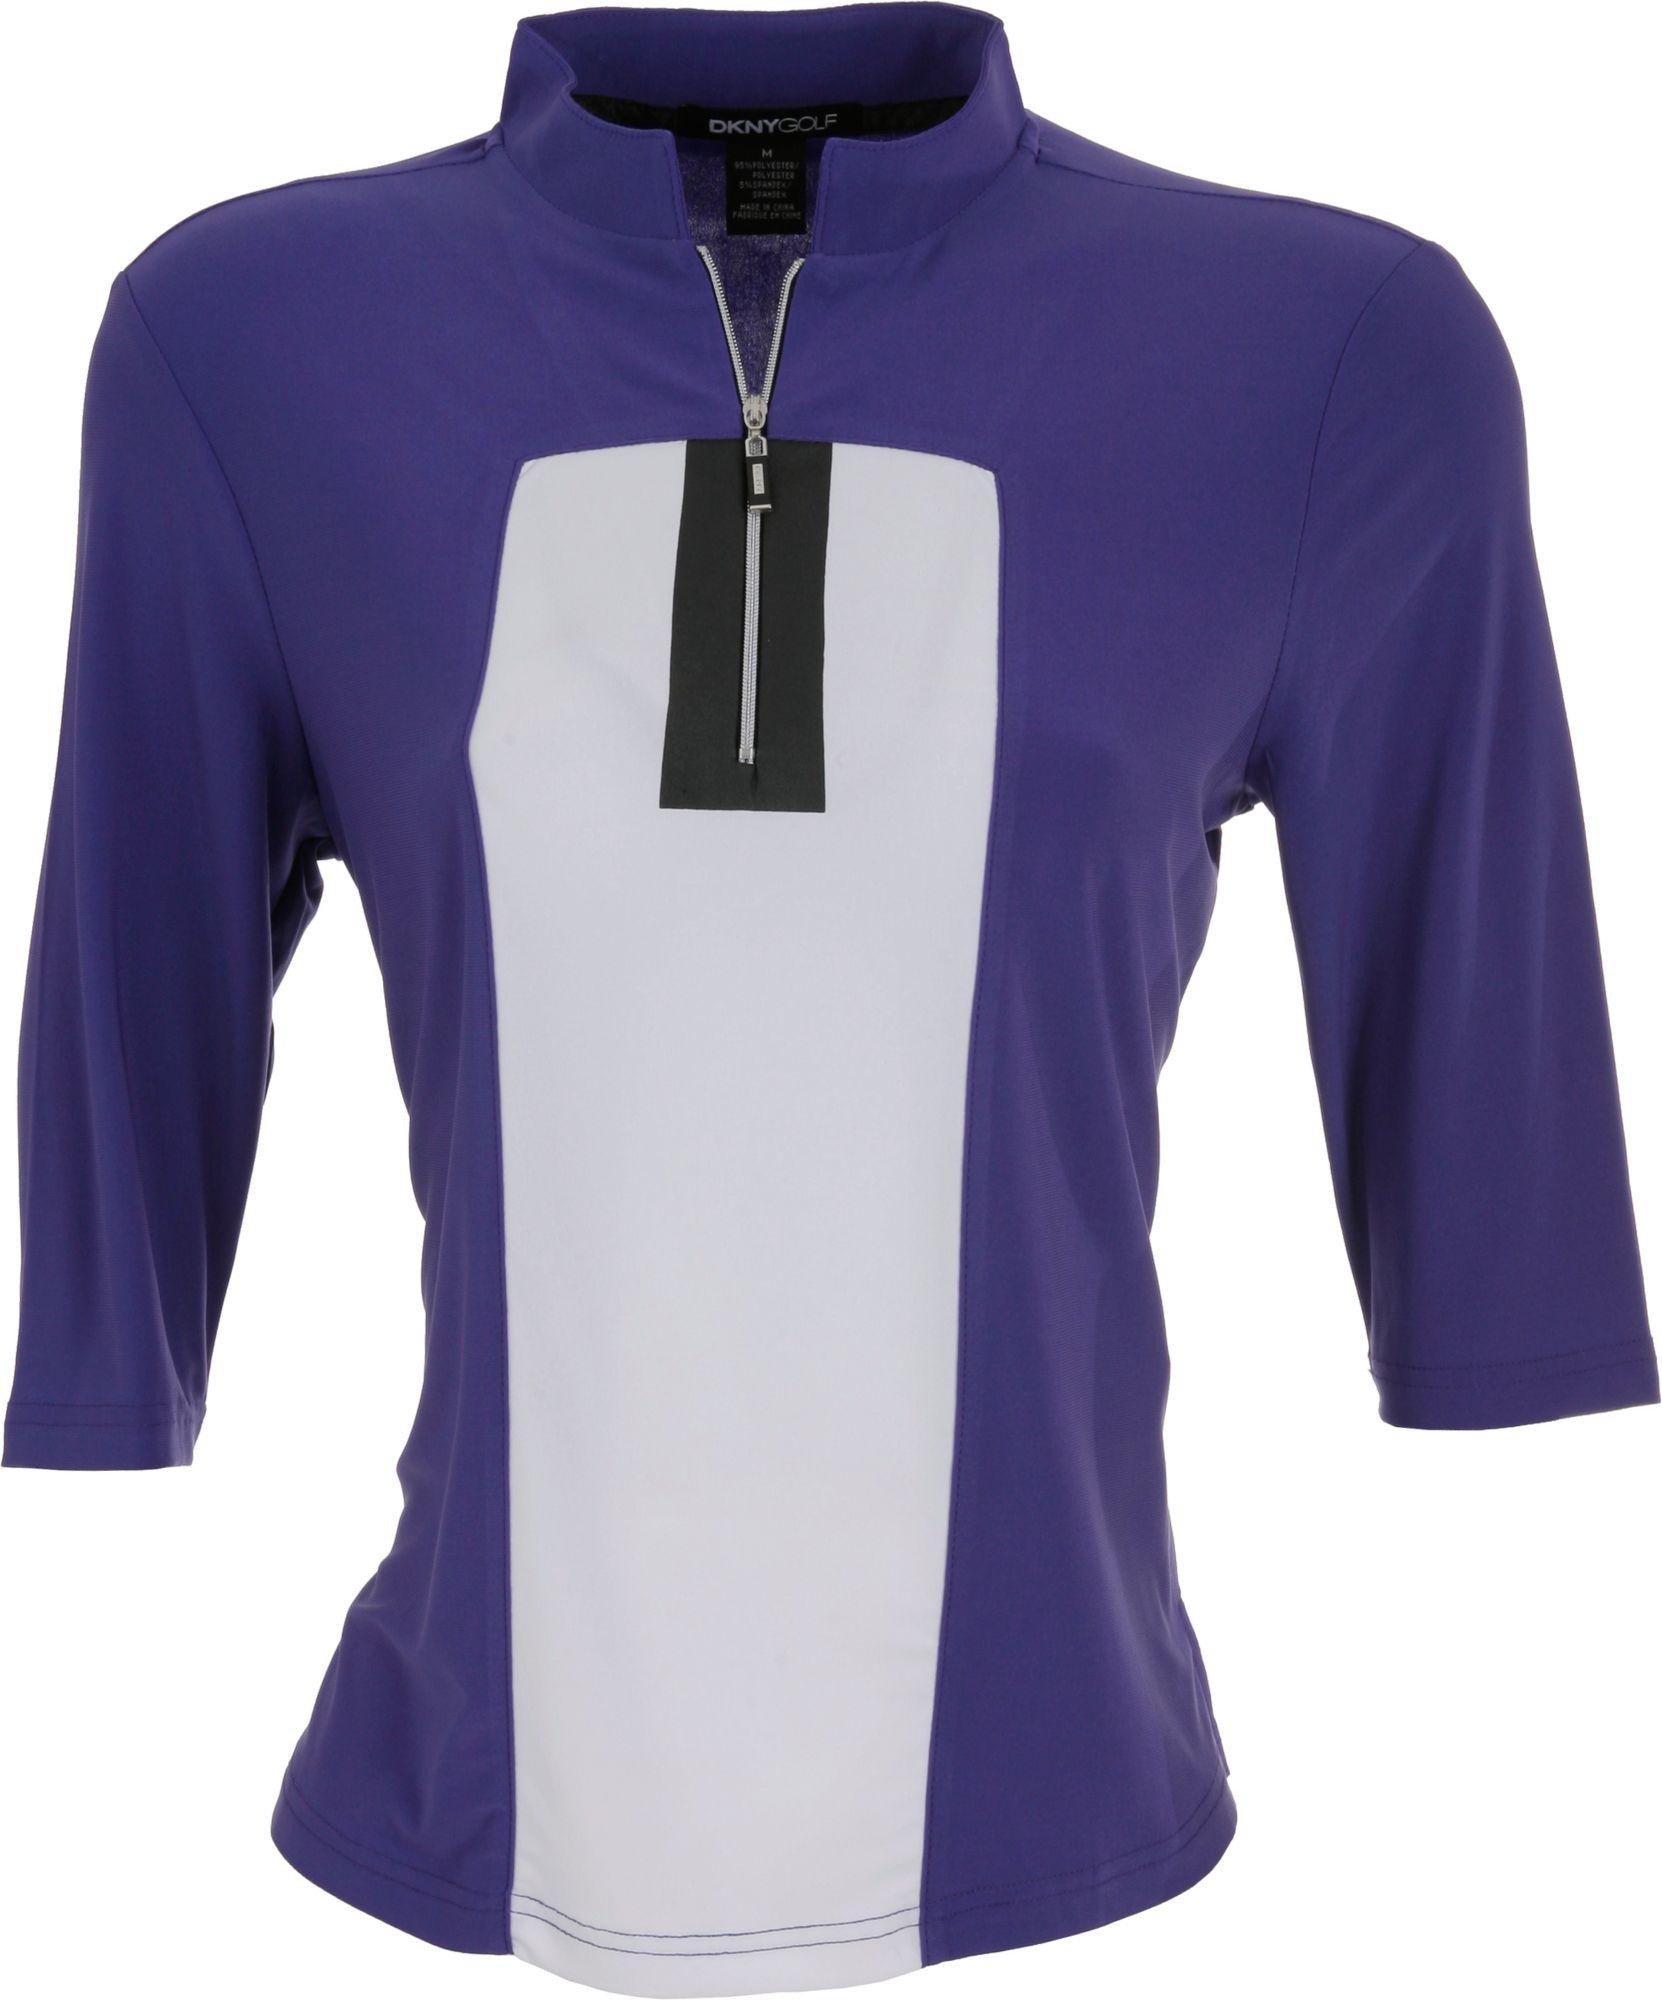 DKNY Women's Zippered Calypso ½ Sleeve Mock